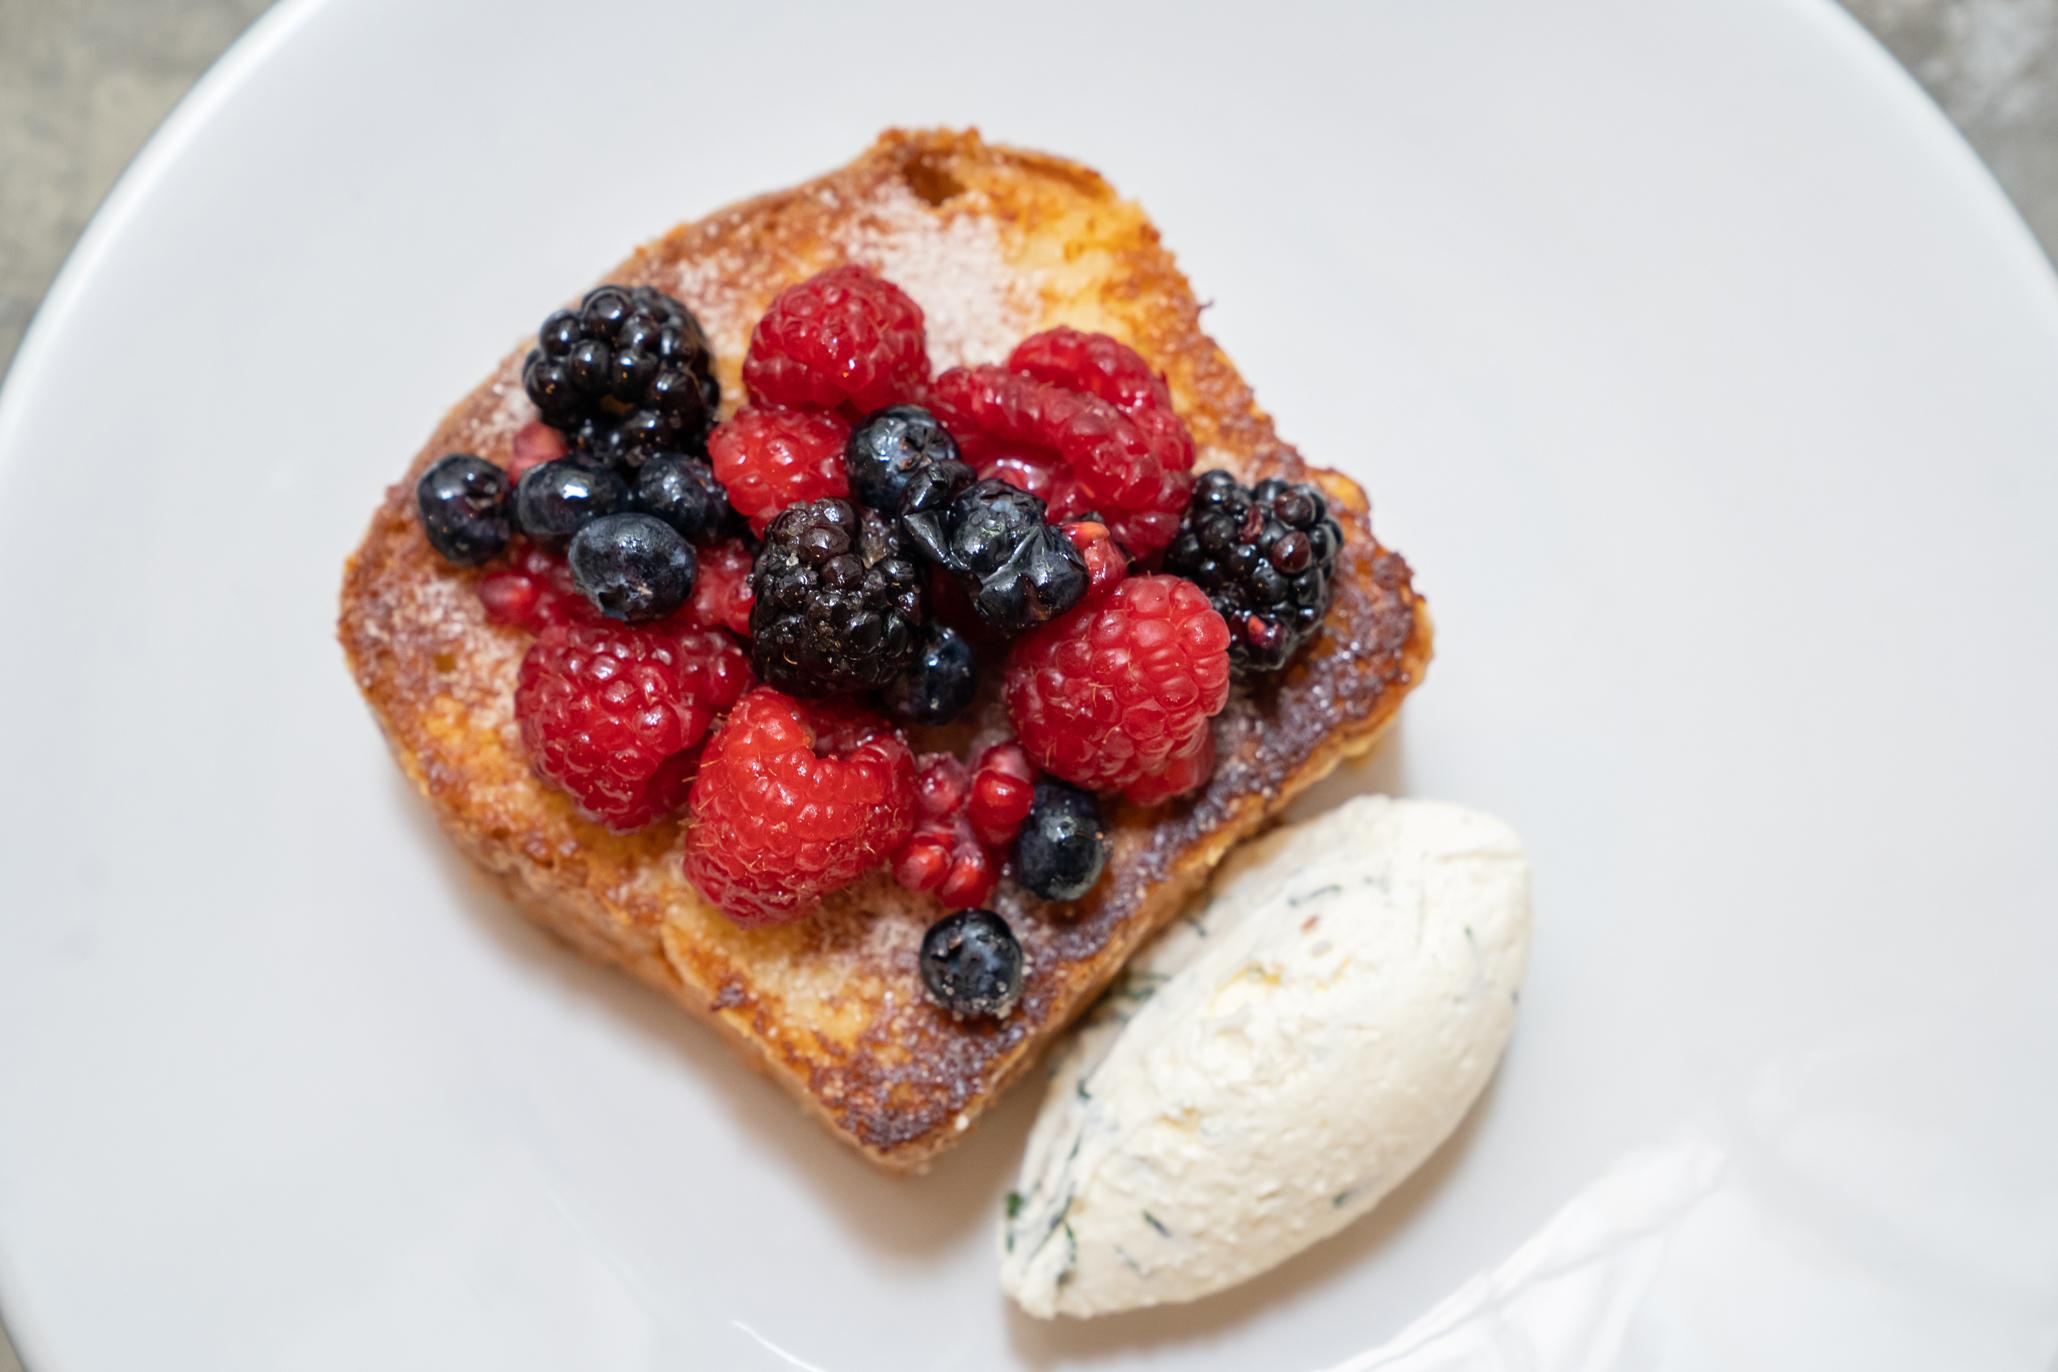 Marne, pan francés